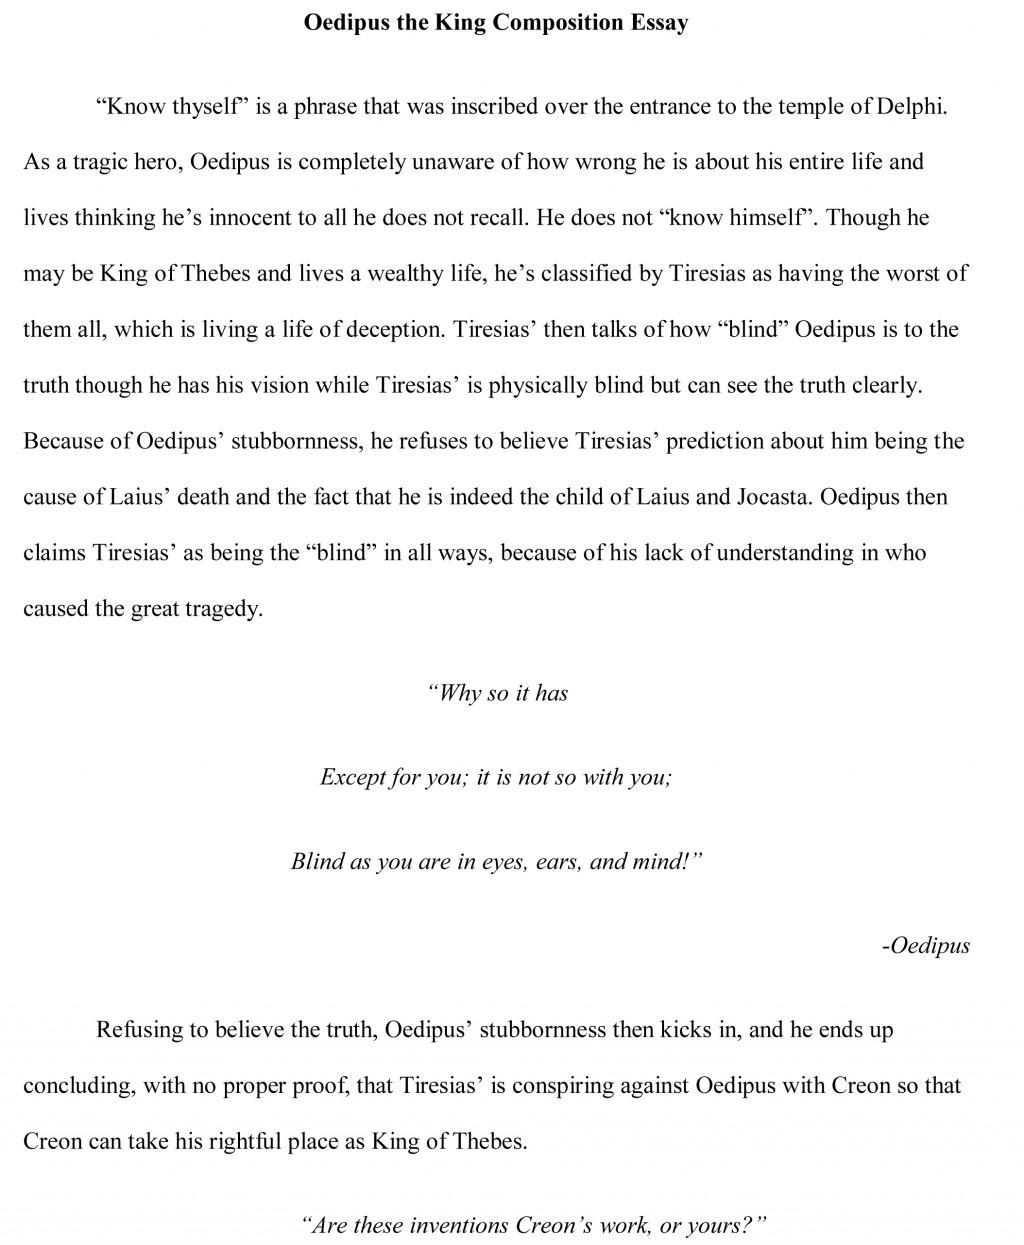 008 Oedipus Essay Free Sample Argumentative Hooks Incredible Hook Examples Pdf Large